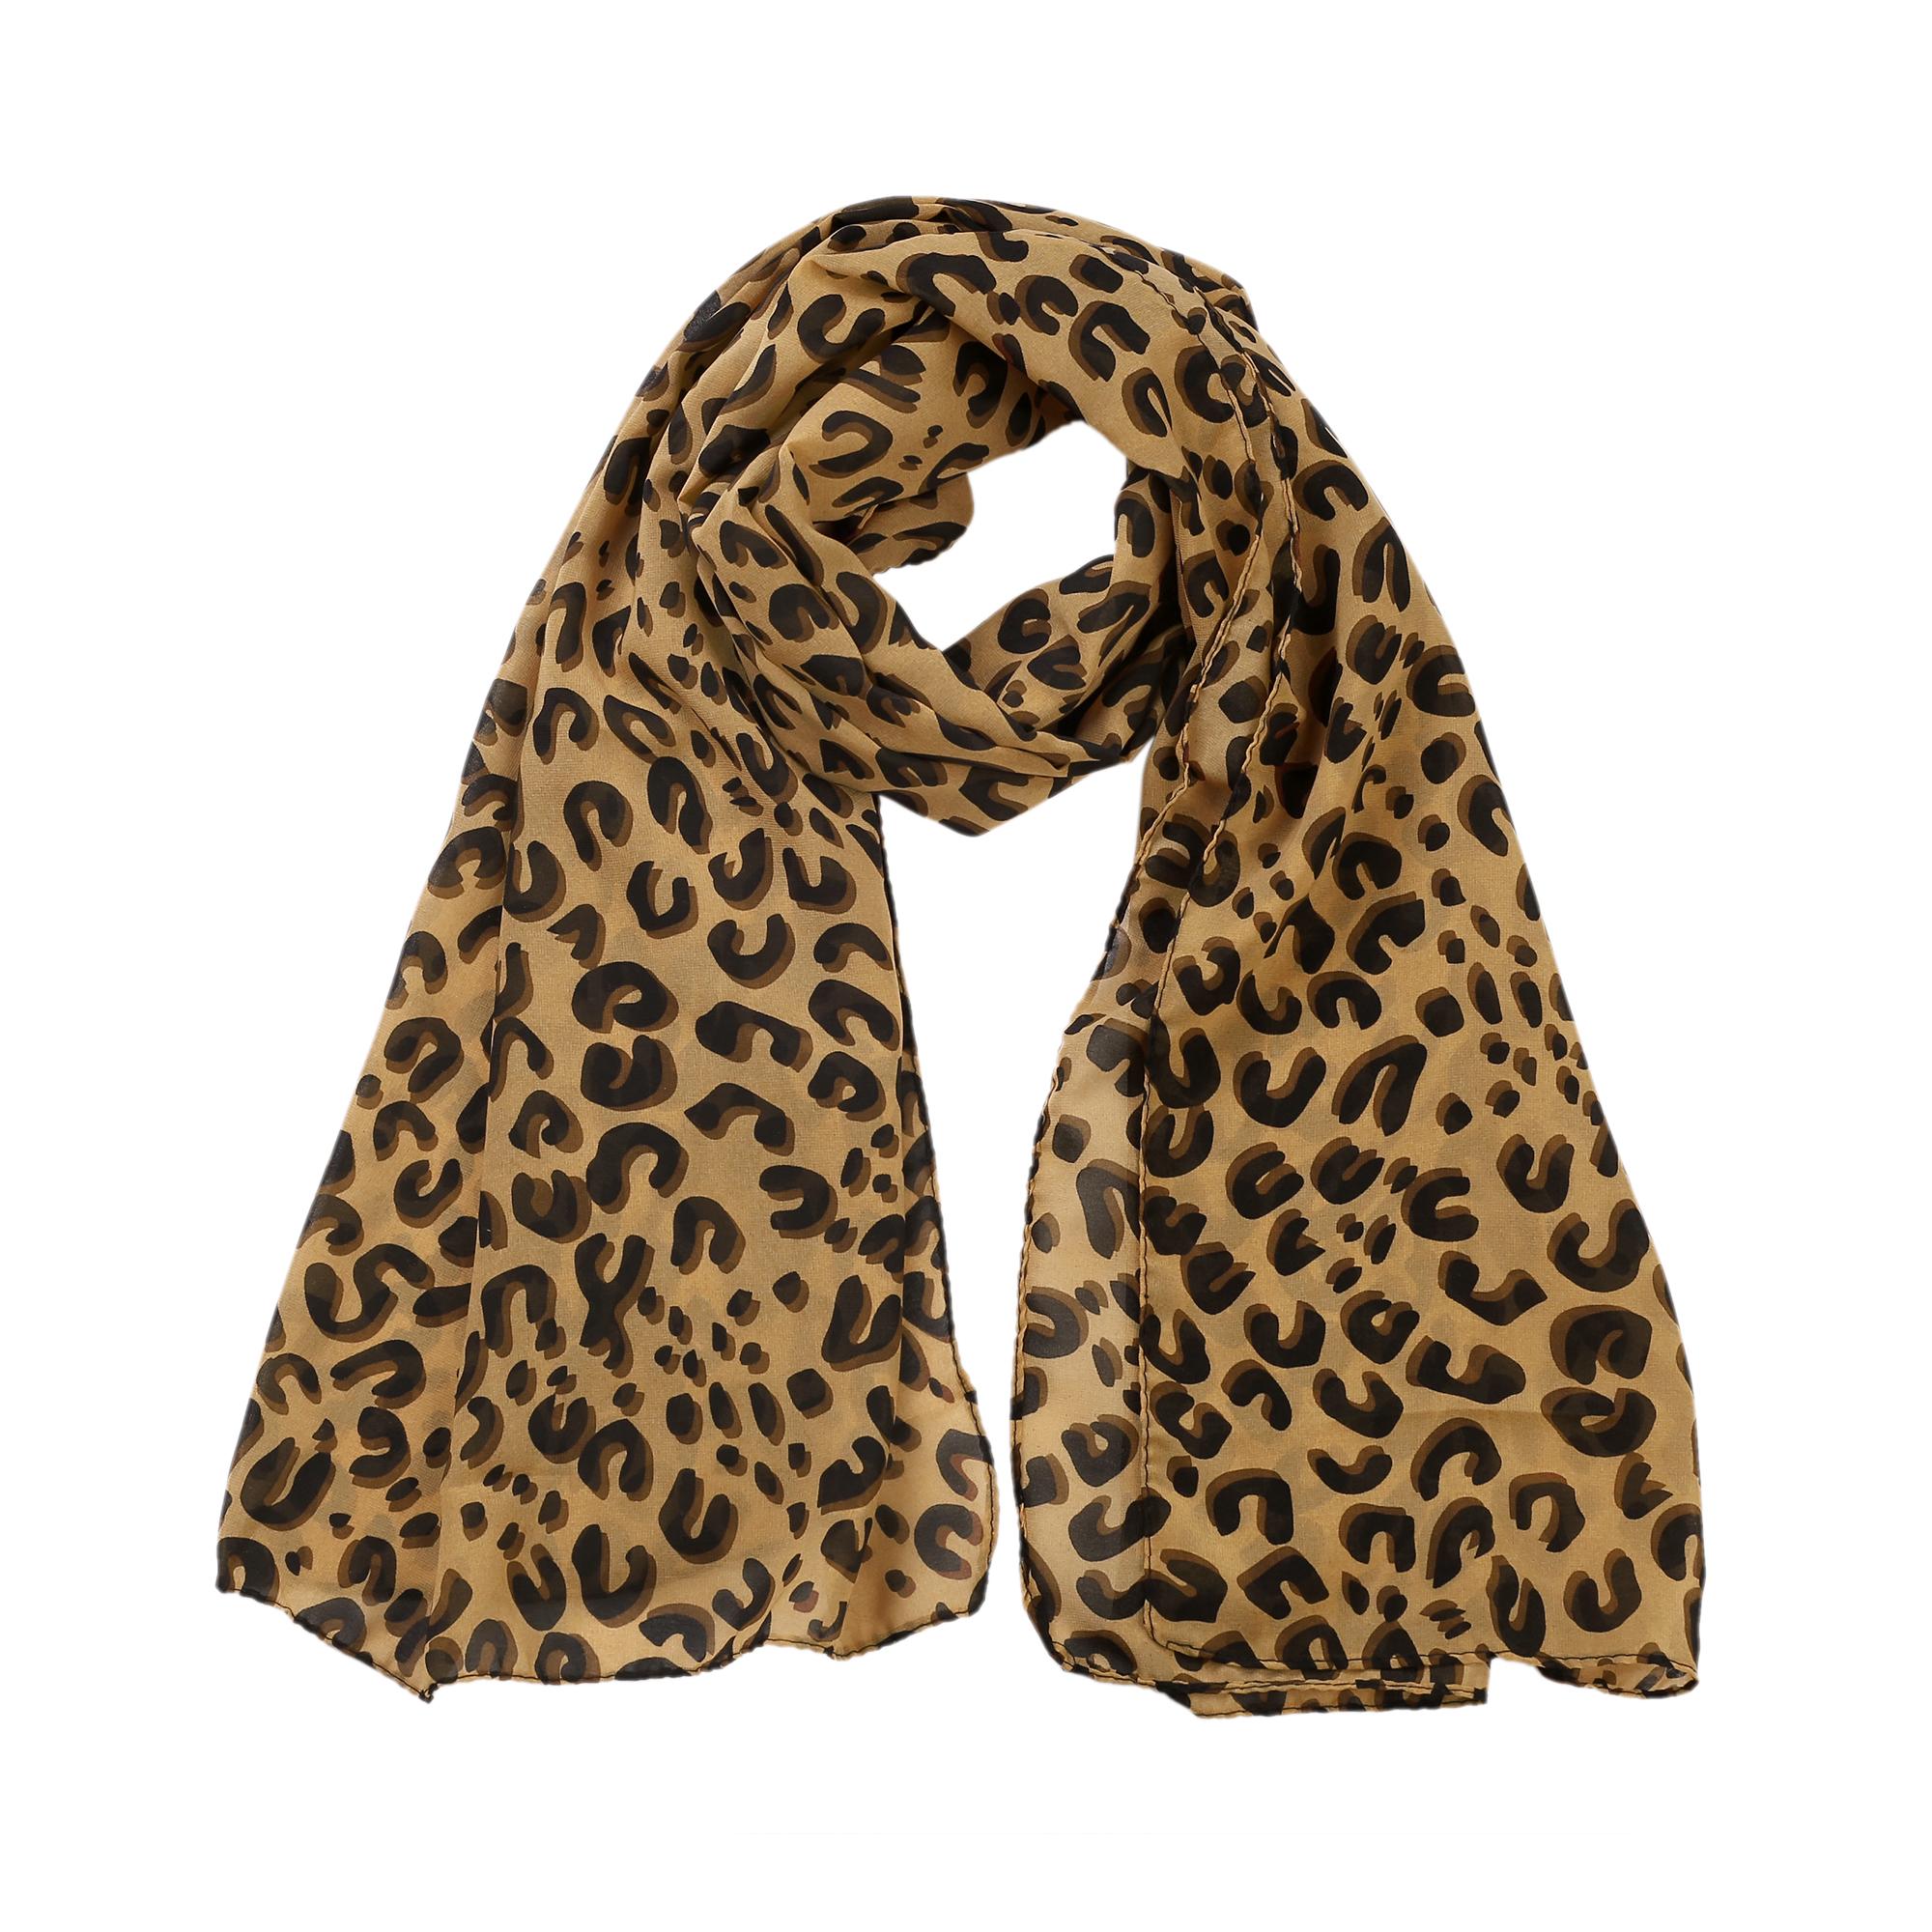 Women Neck Chiffon Leopard Cheetah Print Wrap Stole Shawl Scarf